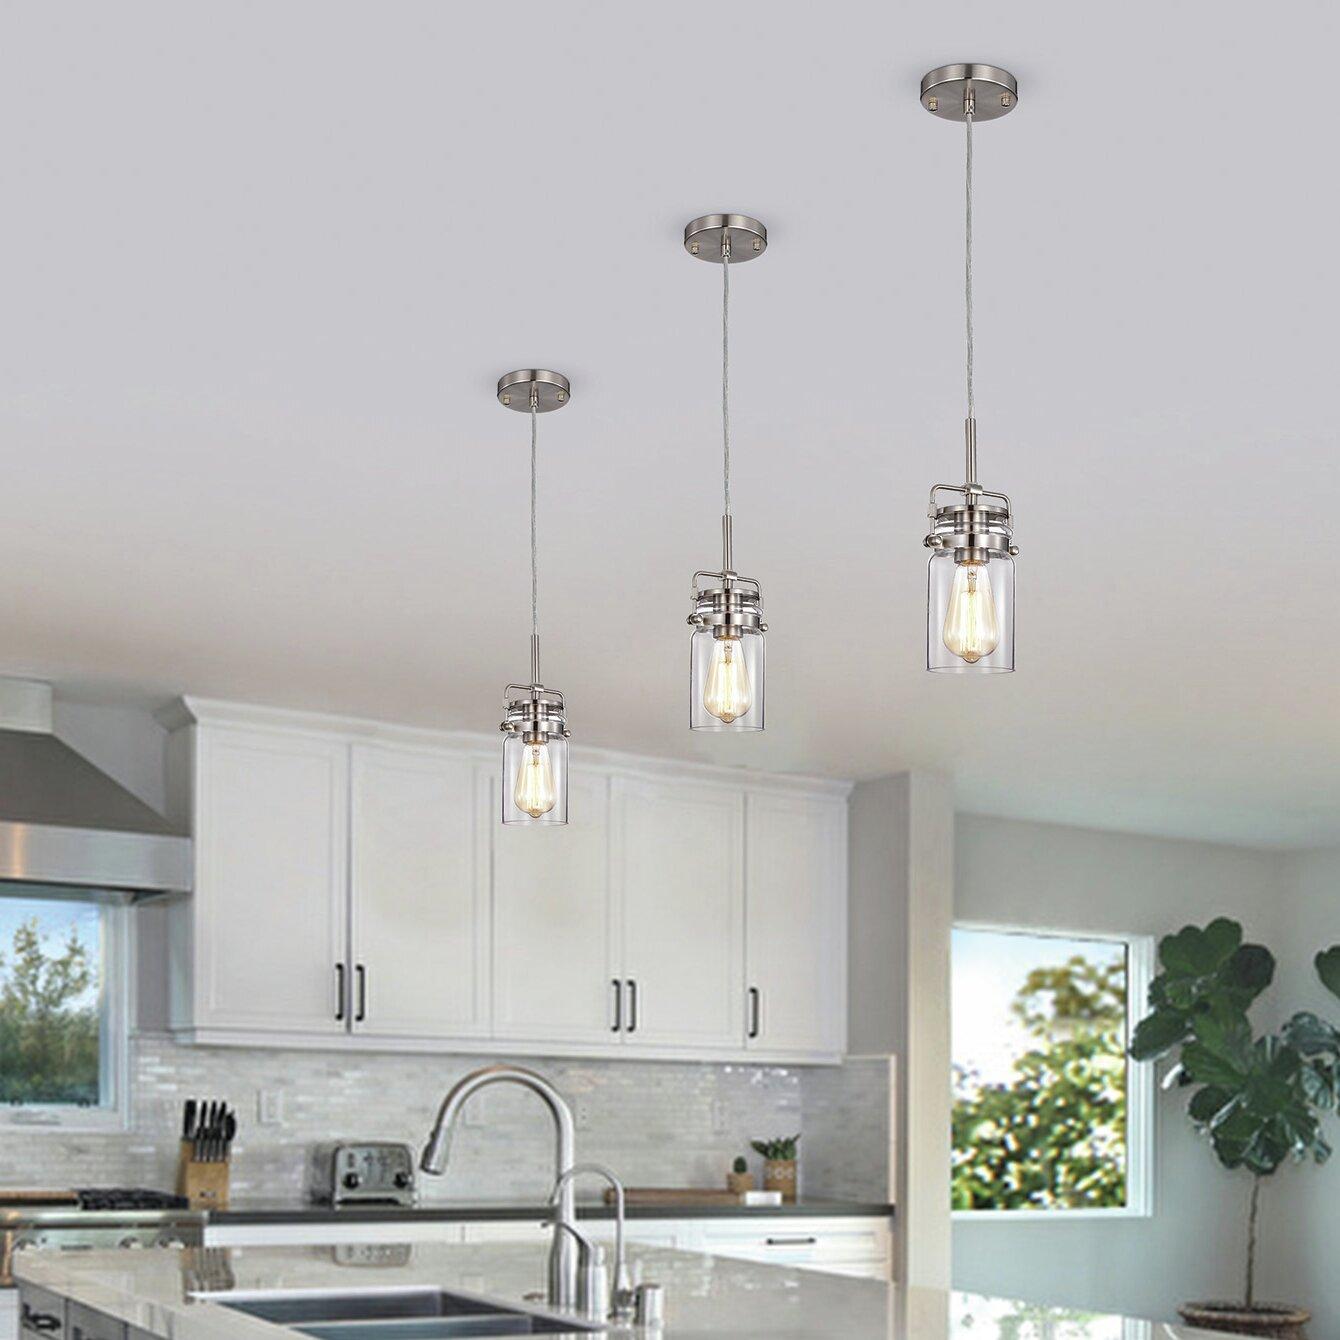 Ceiling Lights ISRAMP 9 Pack Kitchen Bar Lights Pendant Lighting ...